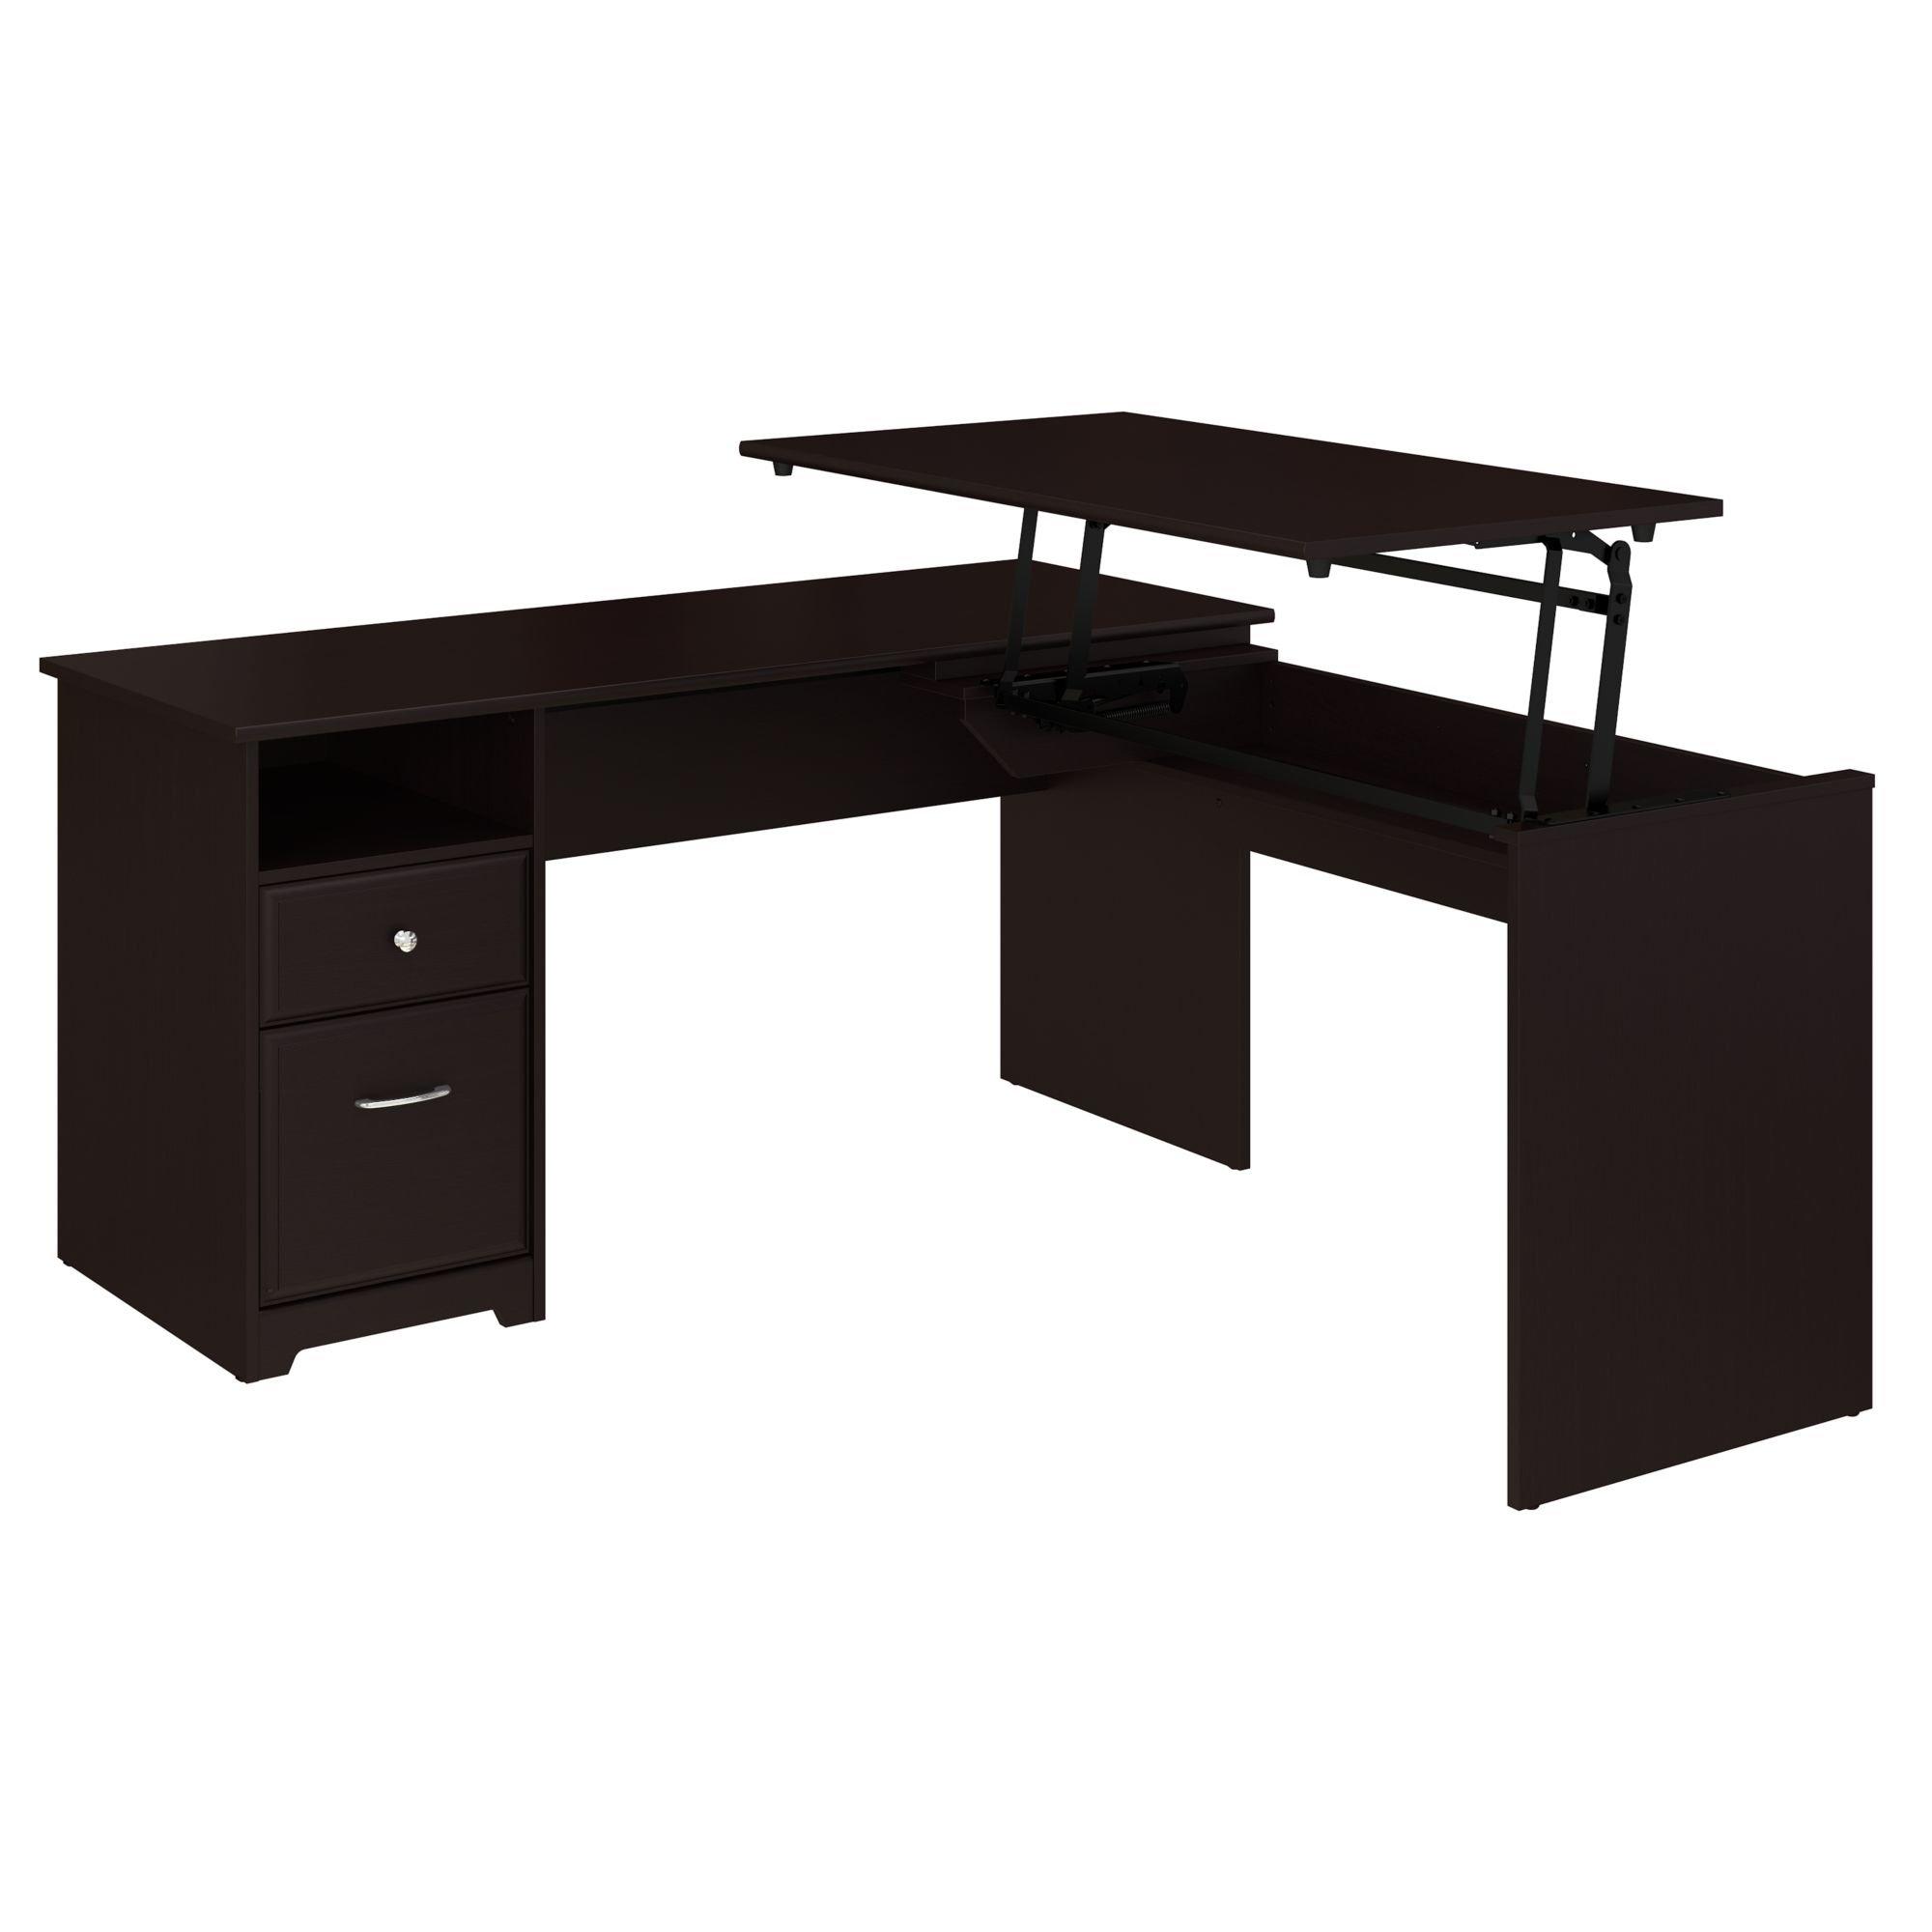 Bush Furniture Cabot 60W 3 Position L Shaped Sit to Stand Desk in Espresso Oak by Bush Furniture